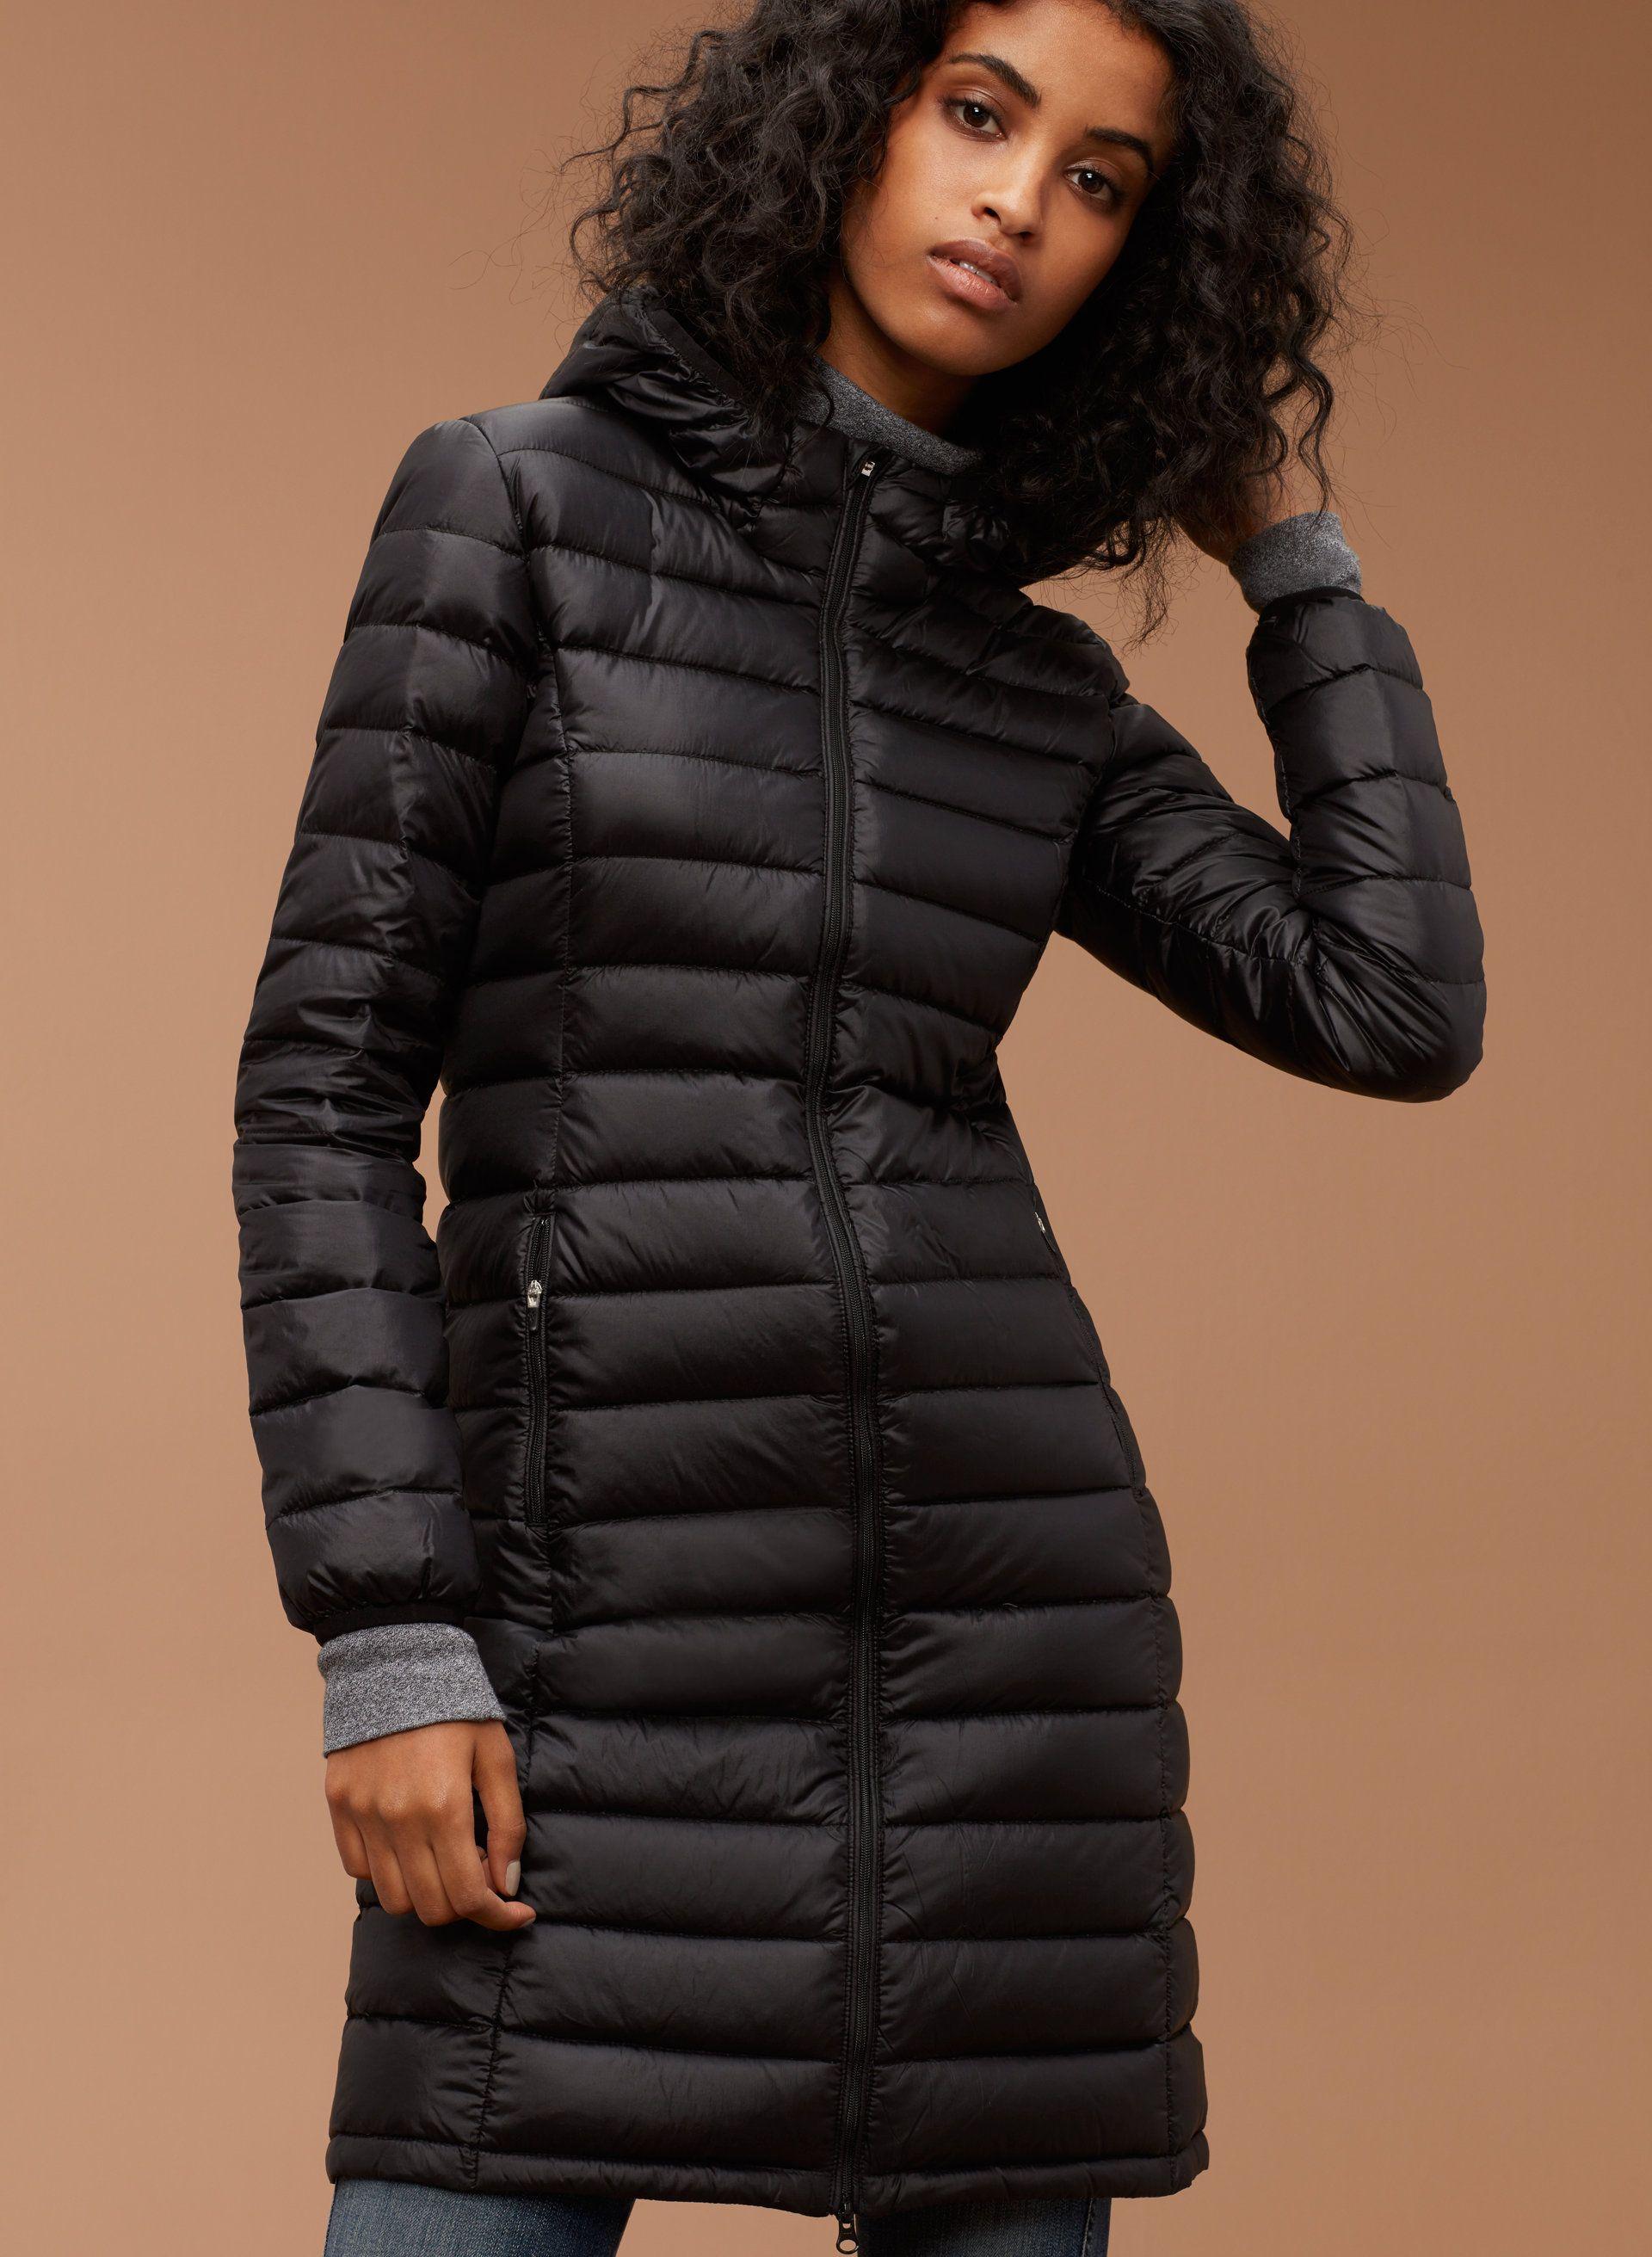 Tna Bravura Jacket Aritzia Jackets Outerwear Fashion